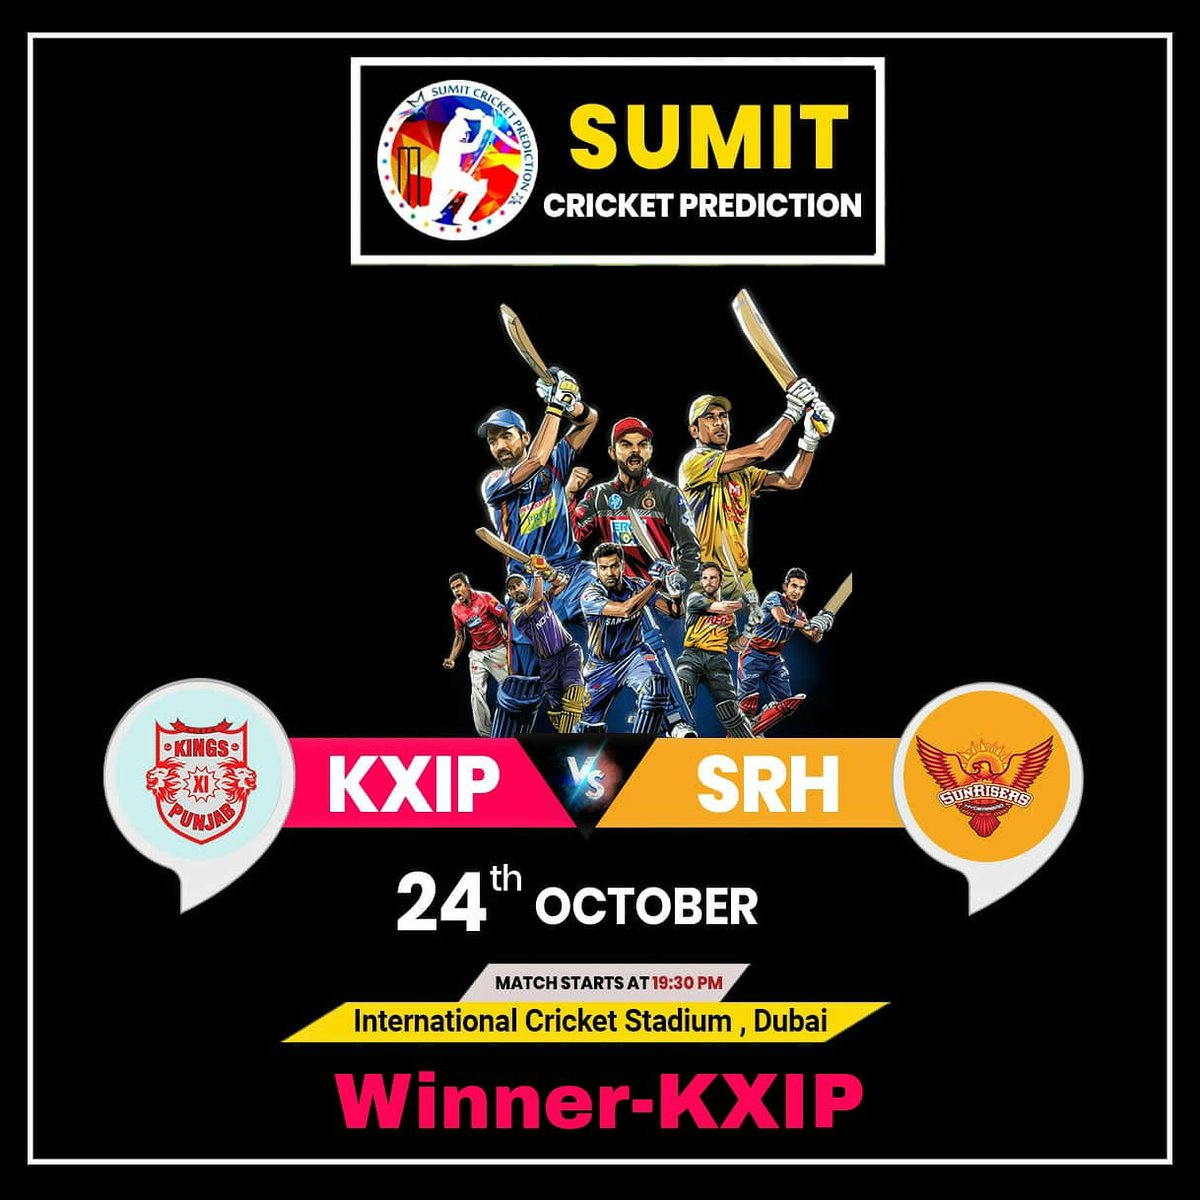 🏏   #IPL2020BigBlast 🏏  🏏 #SRH Vs #KXIP 🏏  ⚜️ Winner-#KxiP ⚜️   #IplT20 #Sumitprediction #Prediction #FreeTips #CricketPrediction  #IPL2020 #IPL  #TodayPrediction #BestTipper #CPL #Tipper  #FreeReport #CricketReport #MumbaiIndians #CKR #CSK #RR #KKR #DP #KXIP #SRH https://t.co/4RIGSDA7mS